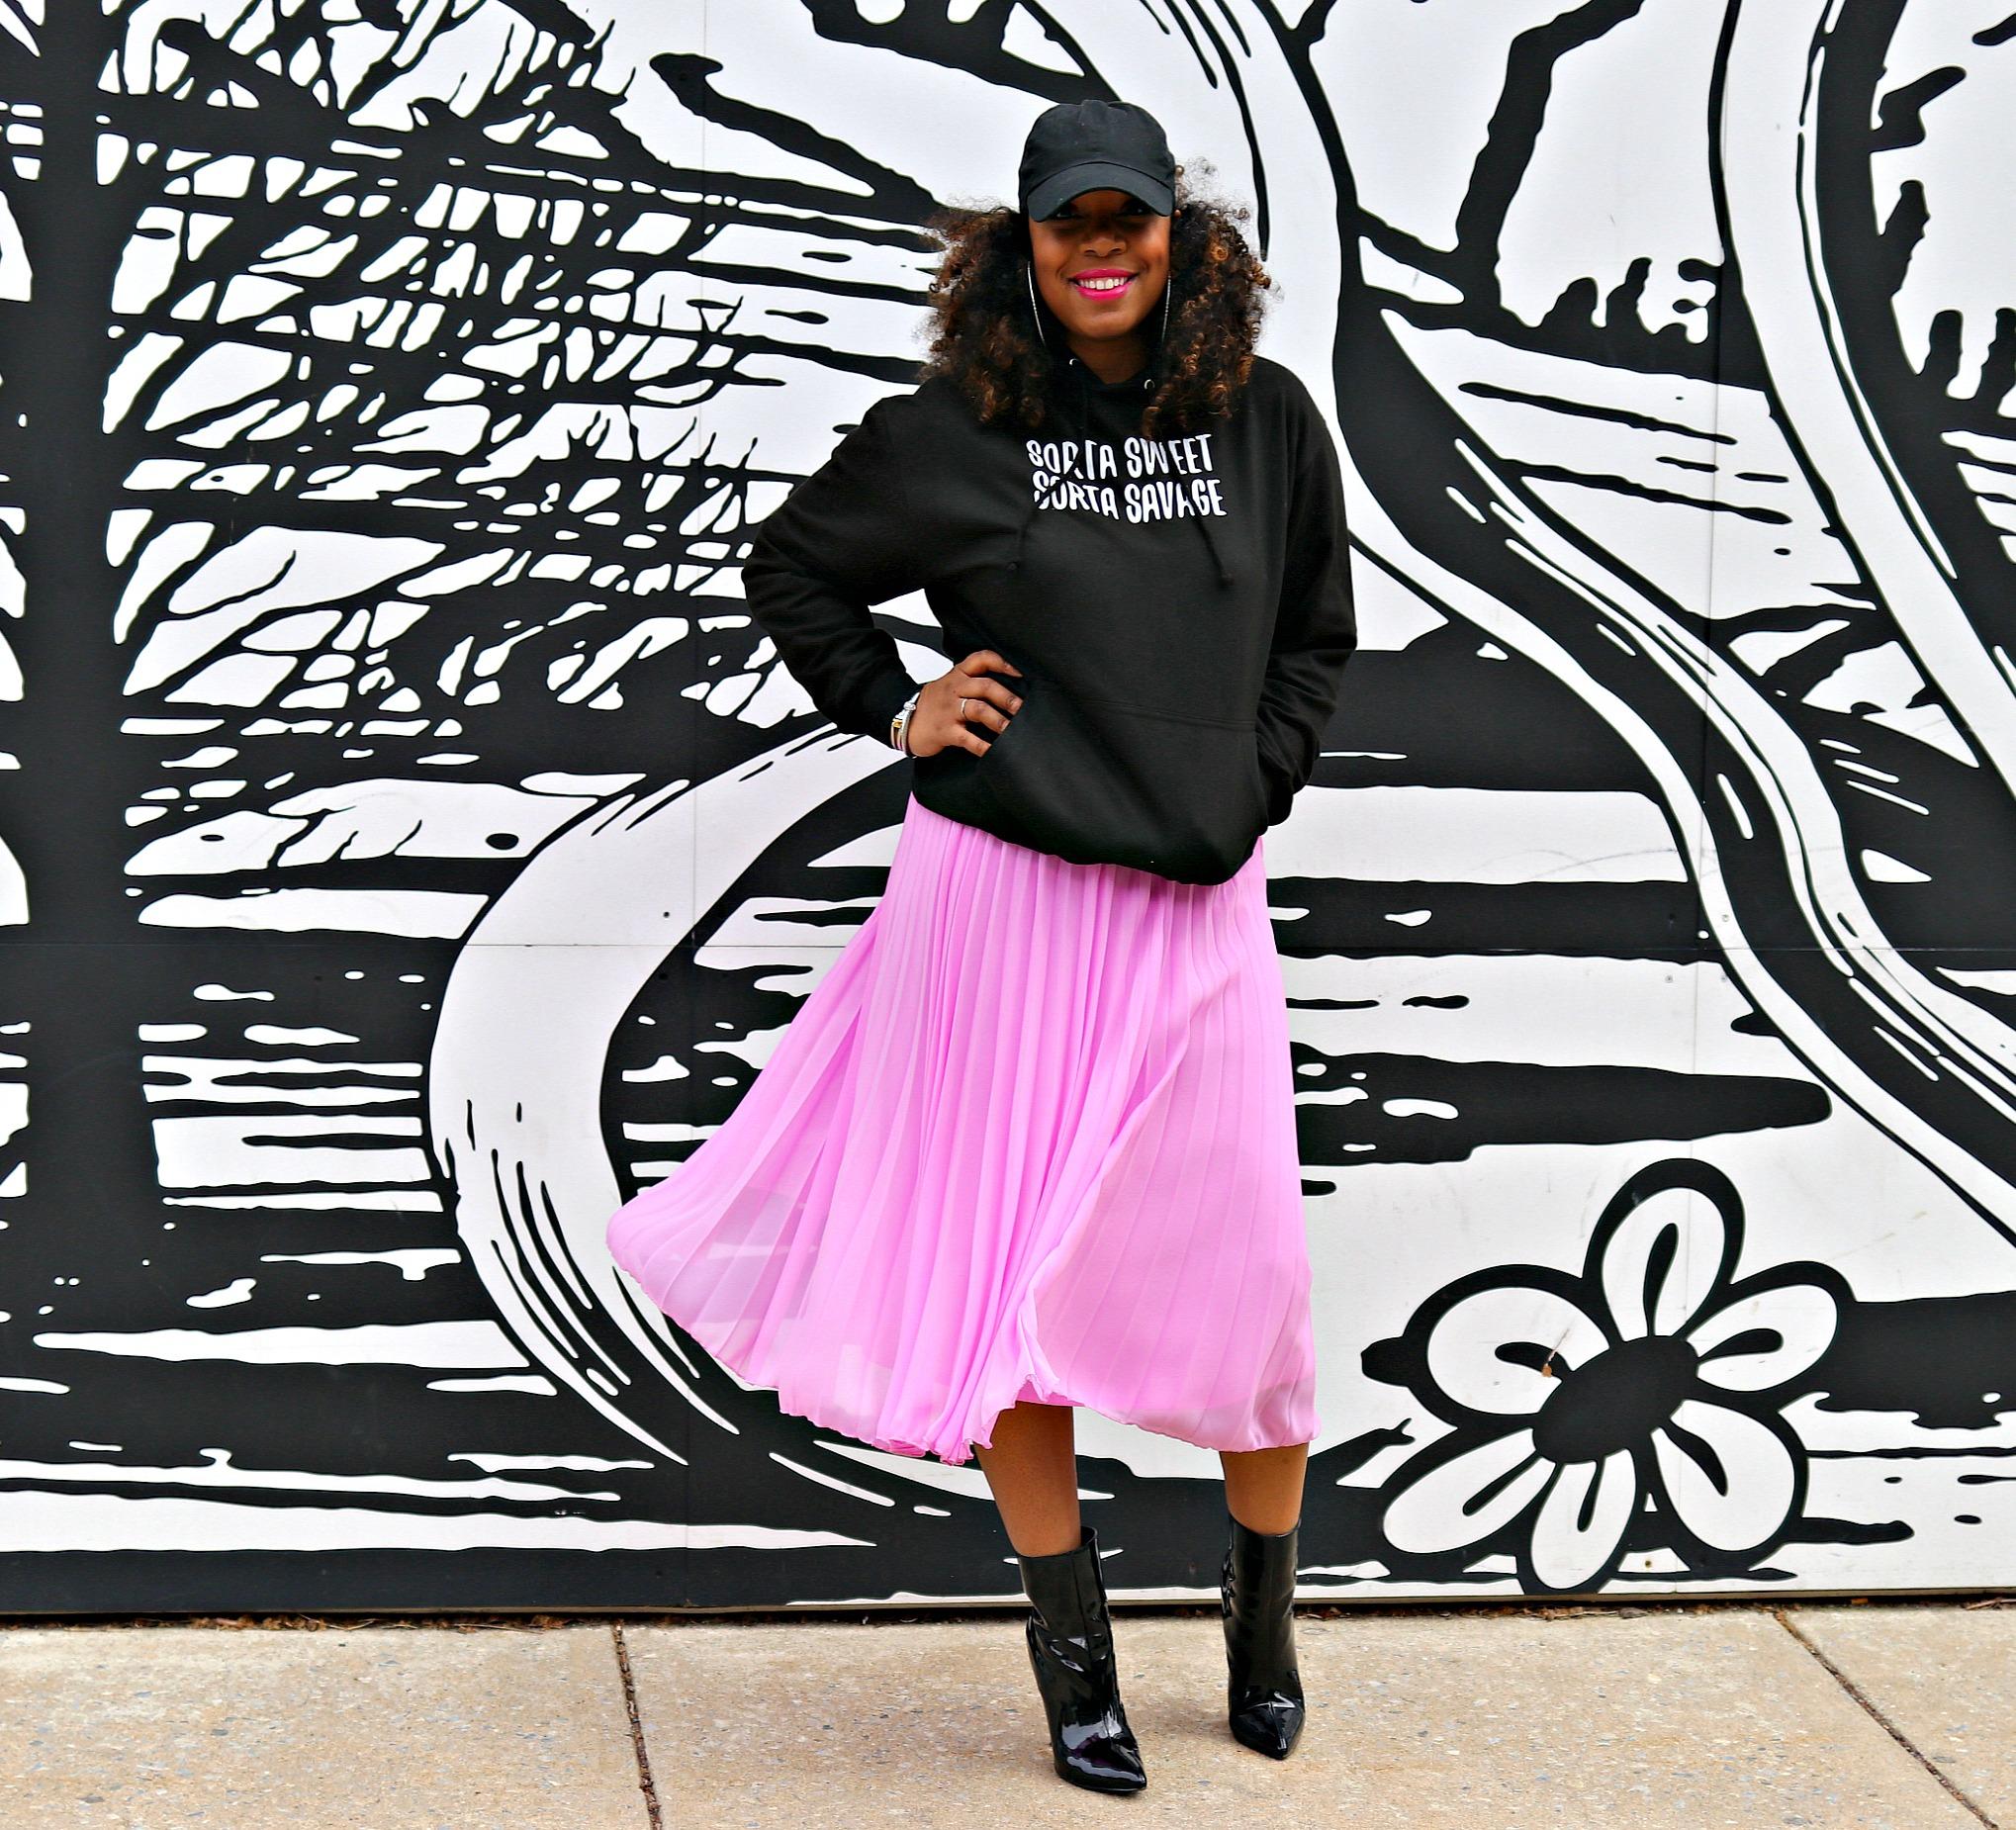 Sorta Sweet Sorta Savage Hoodie, Slogan sweatshirt, how to style a sweatshirt